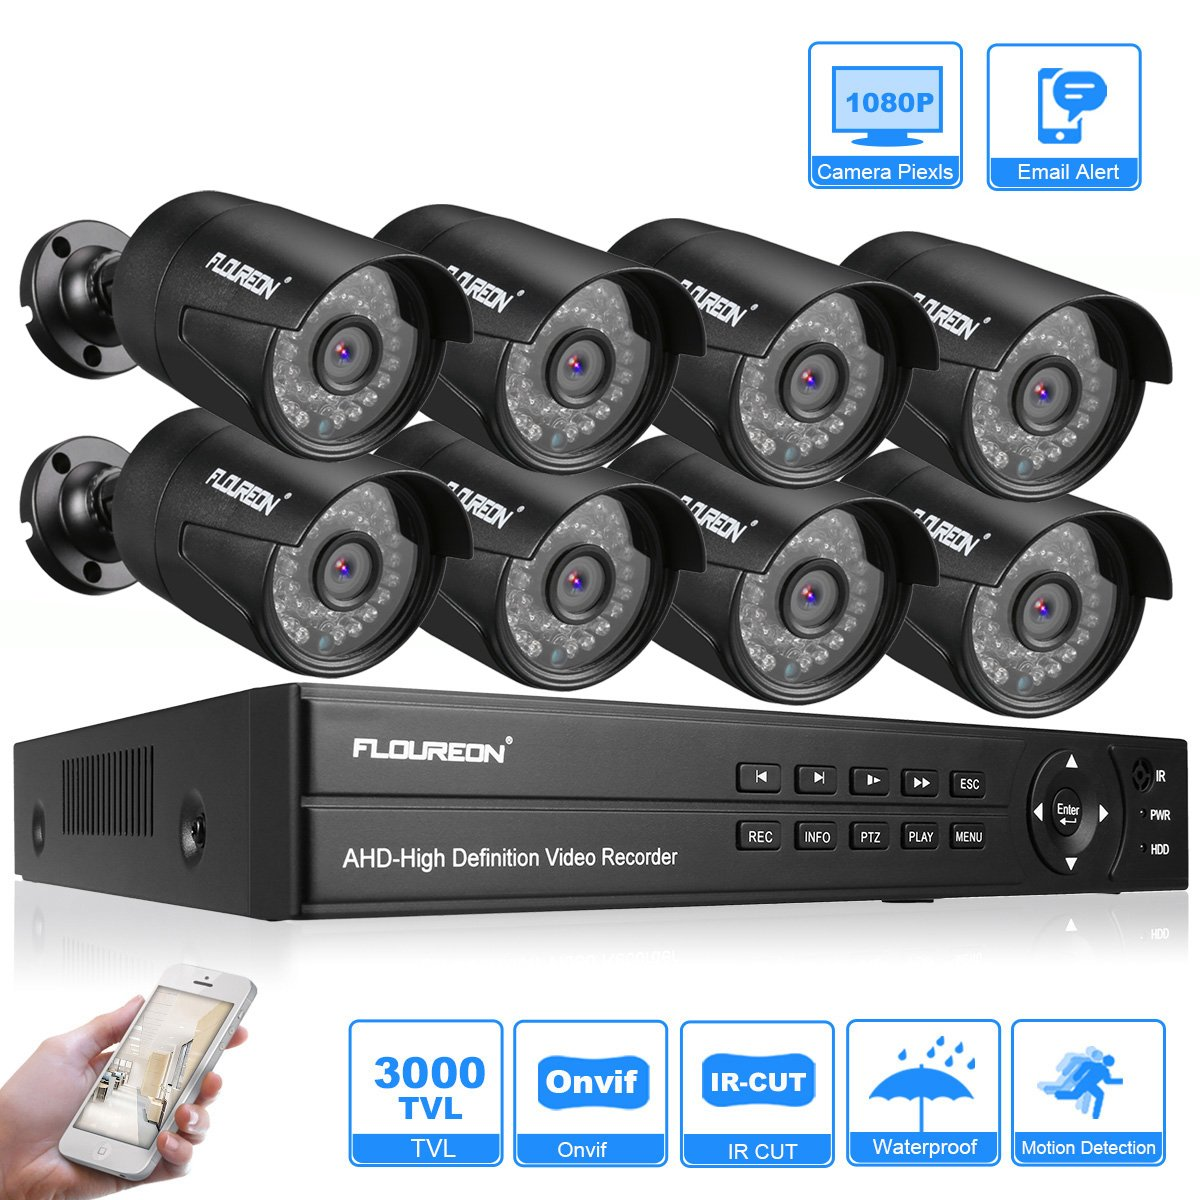 FLOUREON Videoüberwachung 8CH AHD 1080N DVR + 8X 3000TVL 2.0MP Überwachungskamera